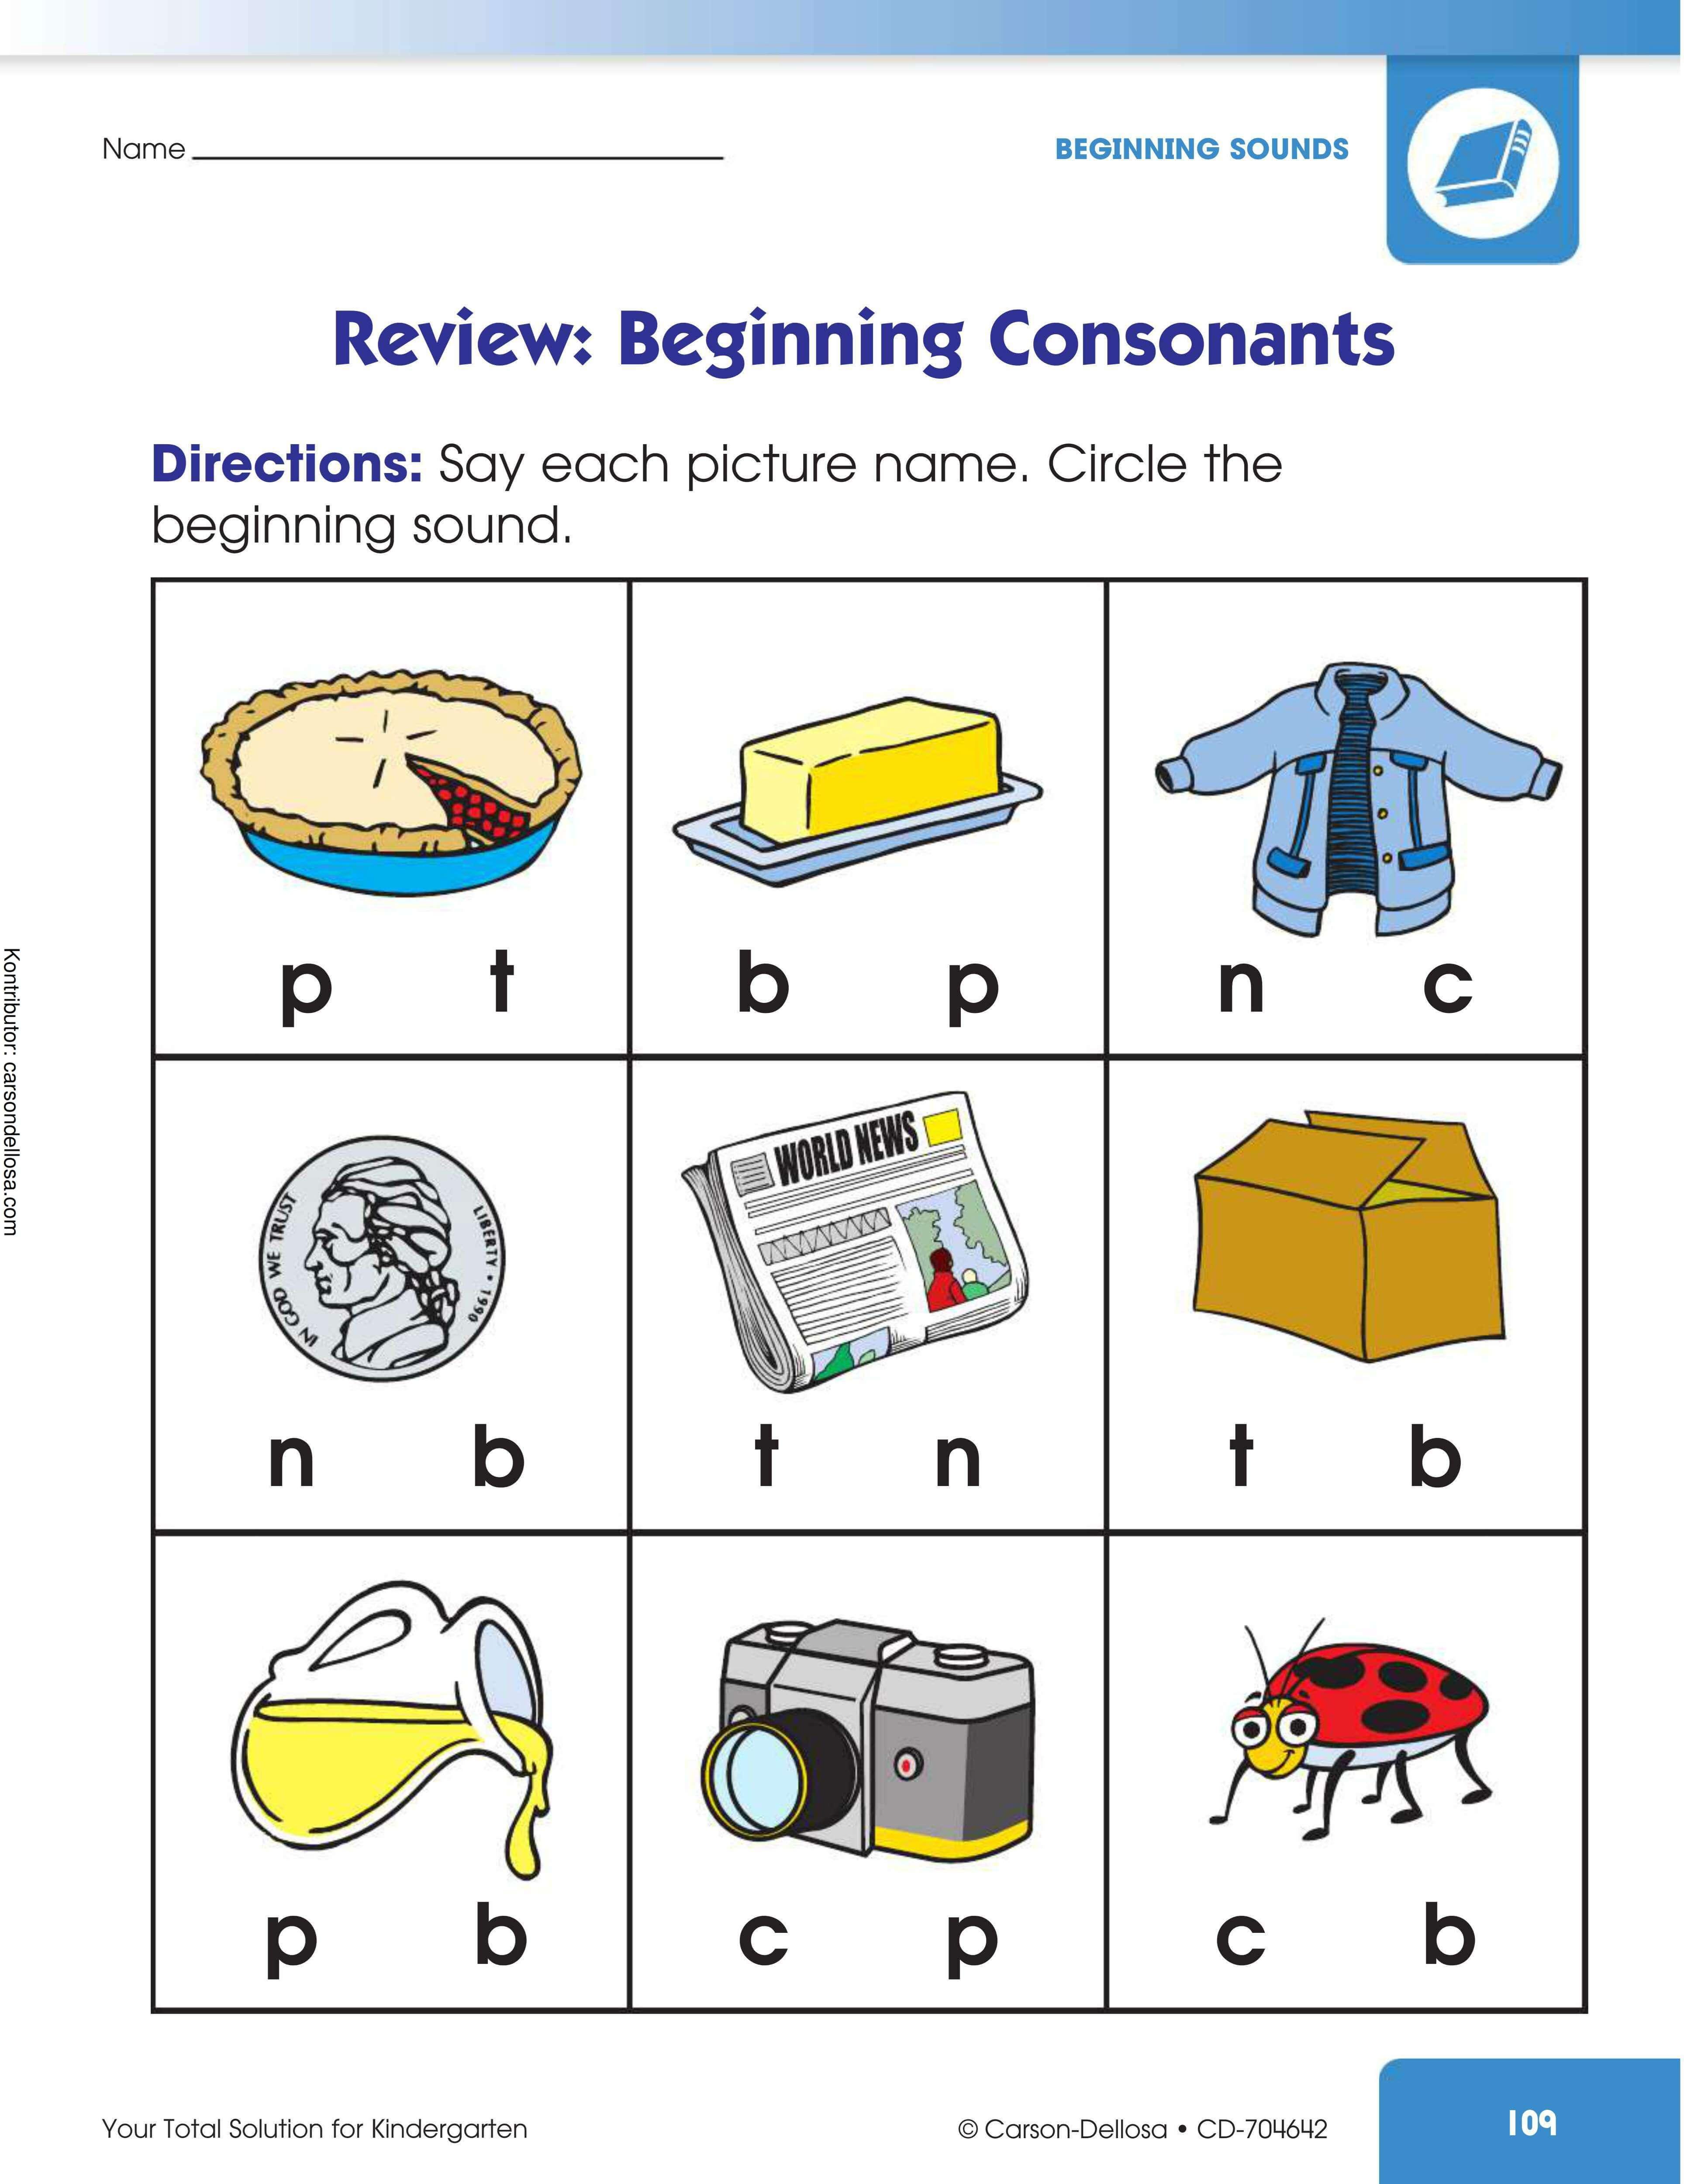 Belajar Mengenal Gambar yang Berawalan Huruf Konsonan (3)